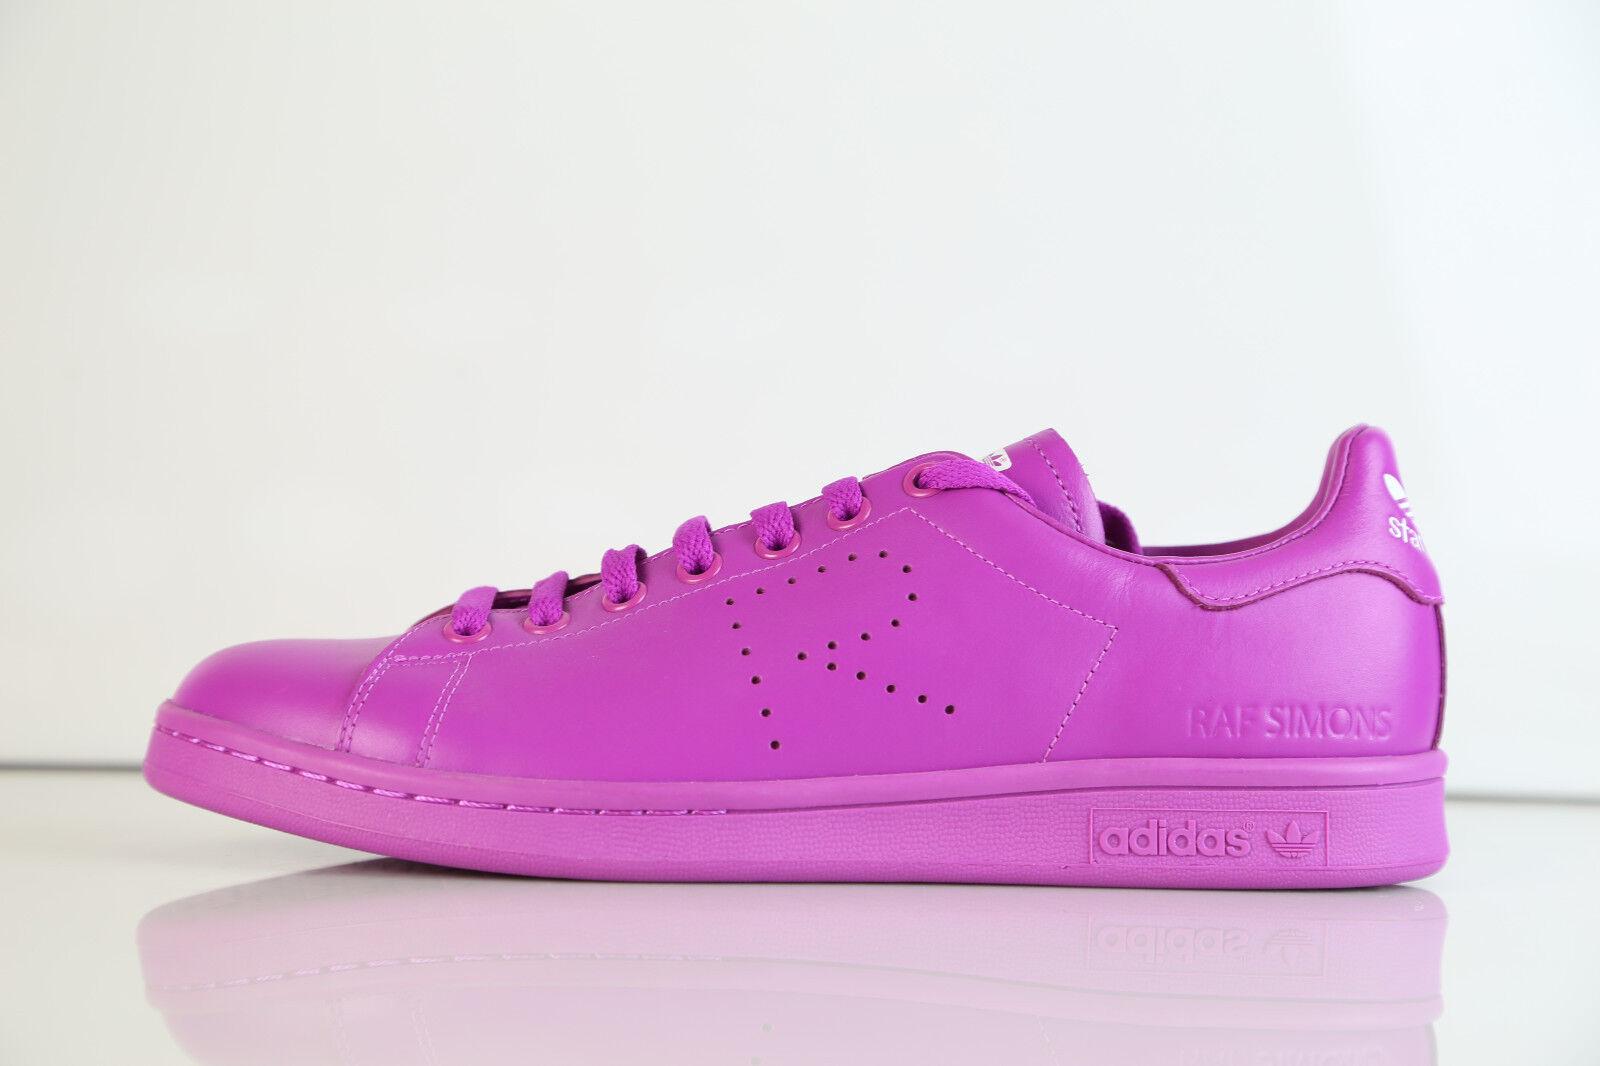 Adidas x raf simons stan smith flash rosa s74593 460 - 12 - leder.